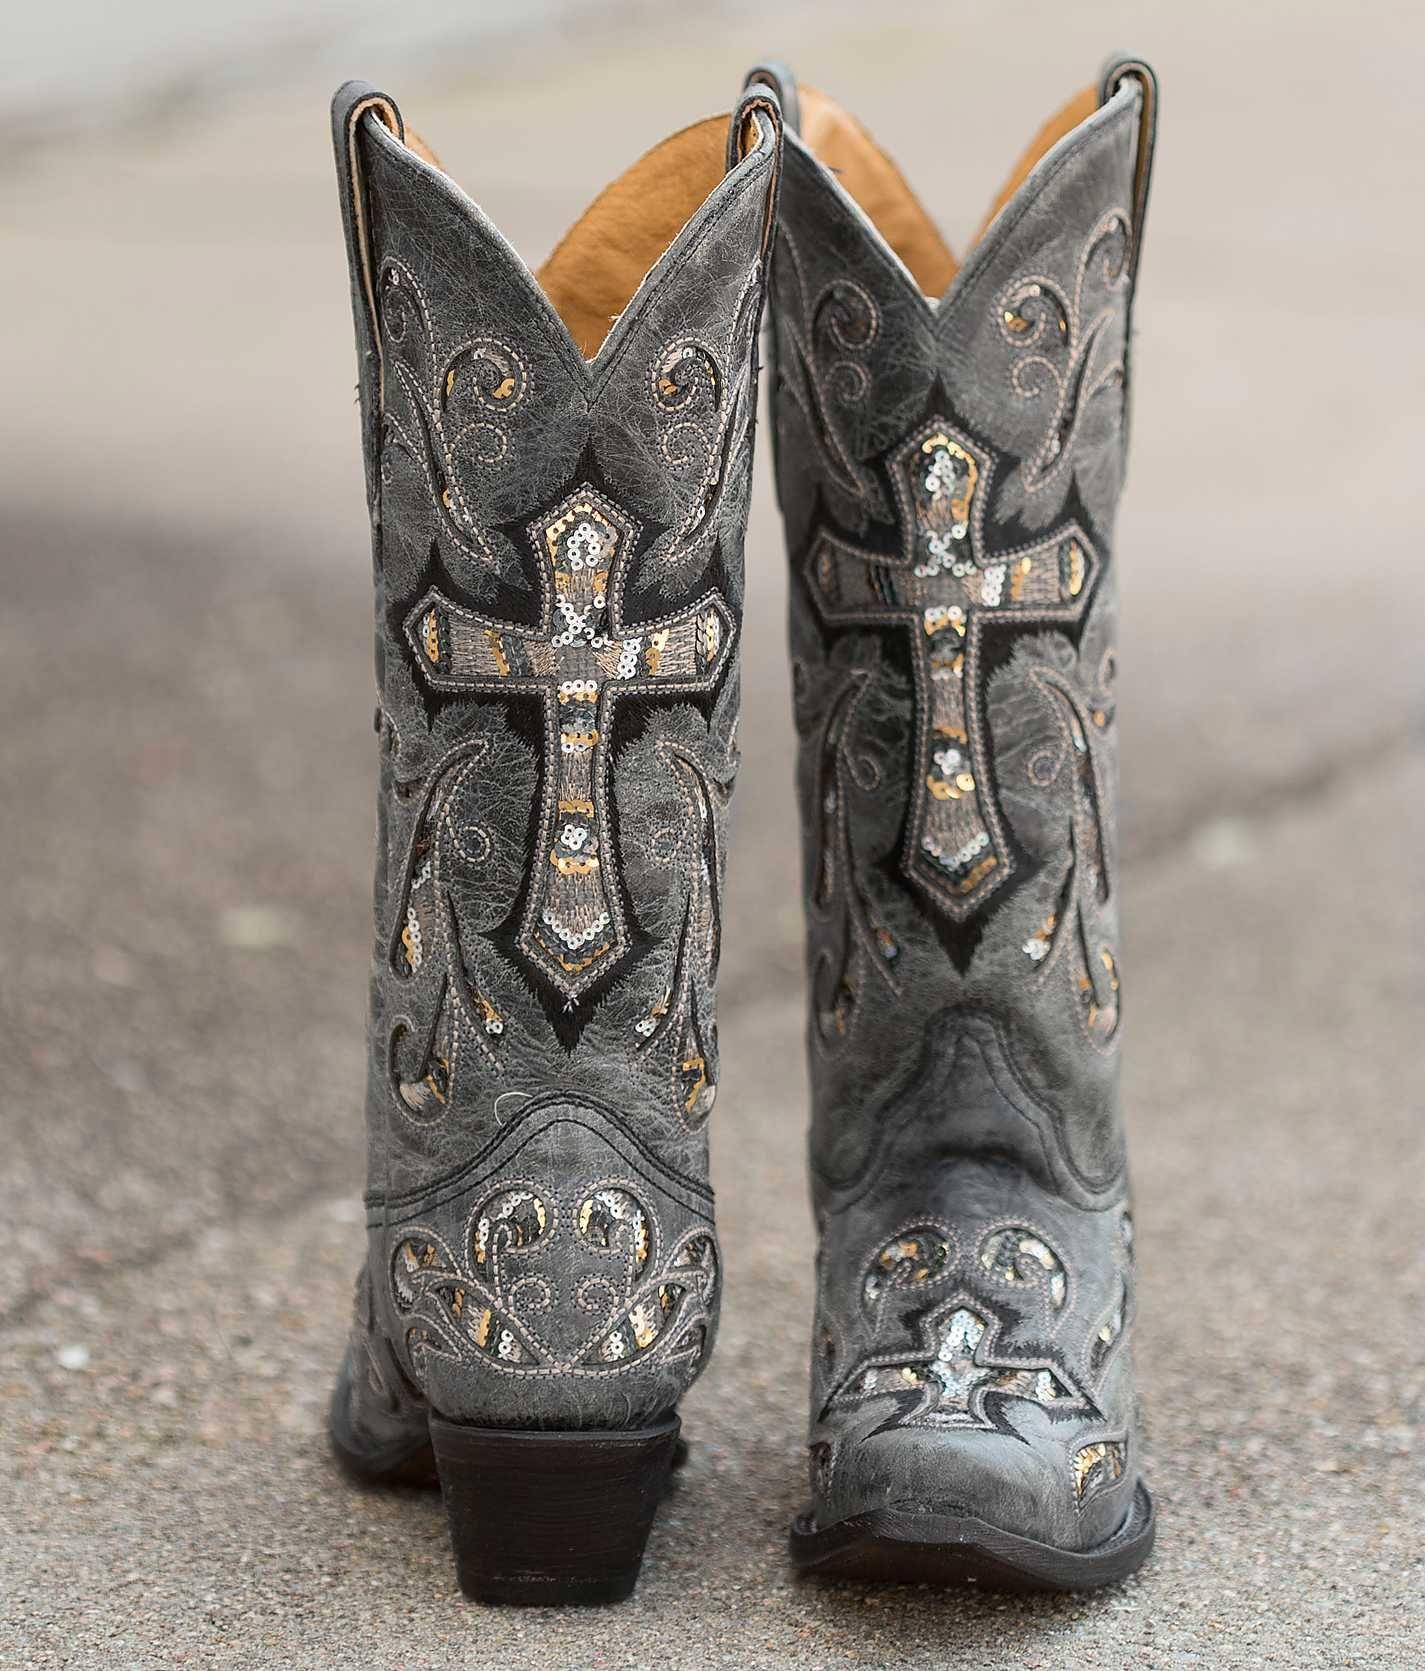 59b0360ebbdac Corral Scarlett Cowboy Boot - Women's Shoes | Buckle | Cowgirl Boots ...